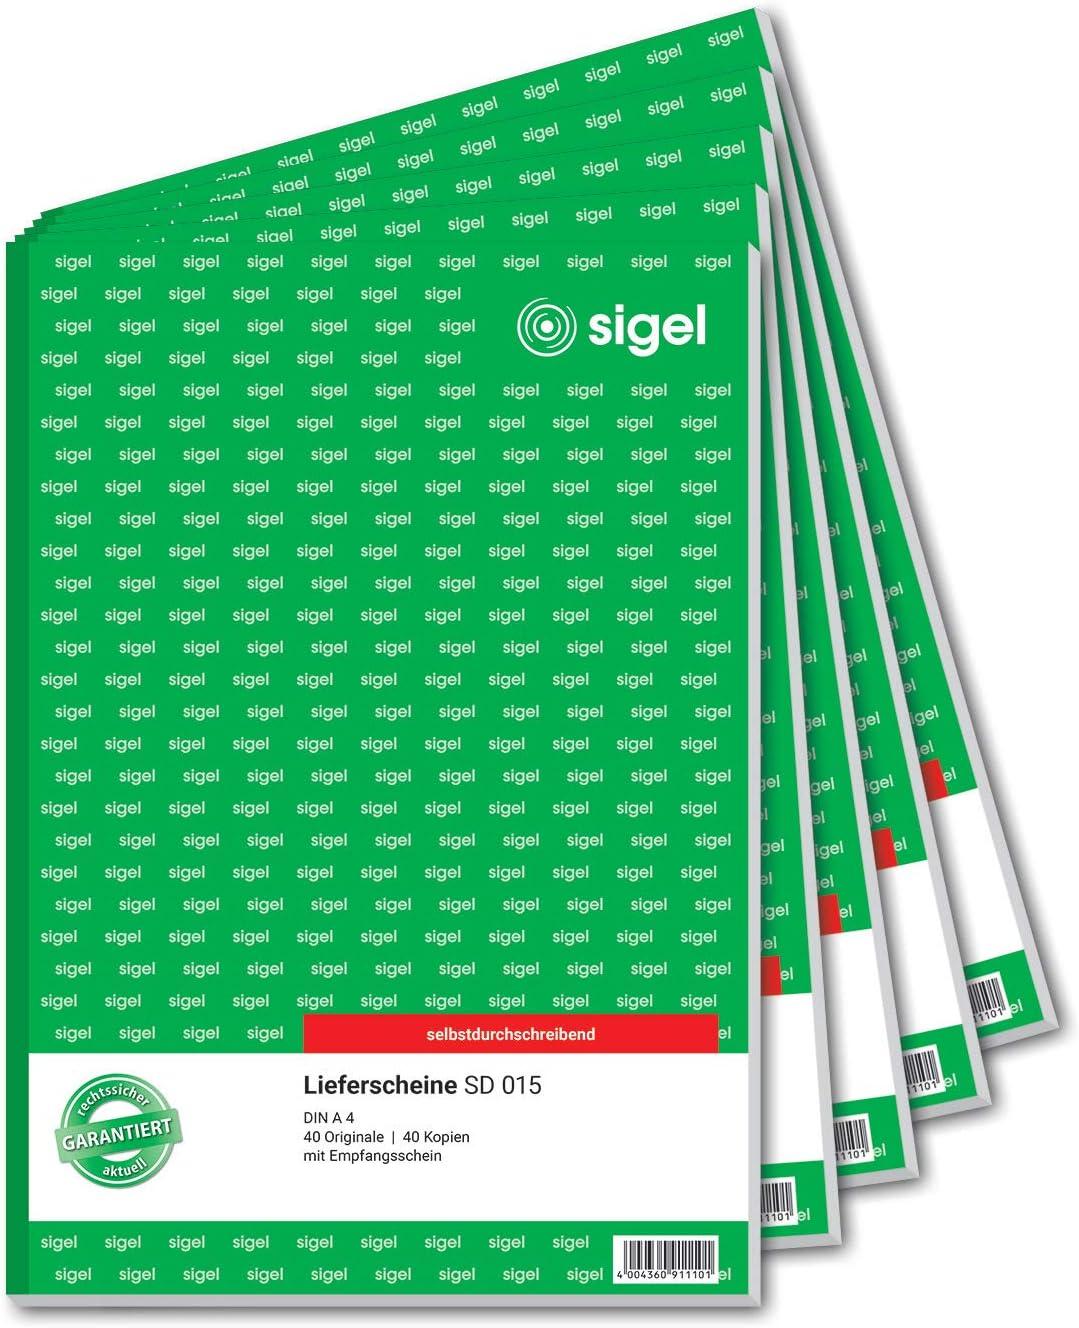 Sigel Sd015 5 Lieferscheine A4 2x40 Blatt Selbstdurchschreibend 5er Pack Bürobedarf Schreibwaren